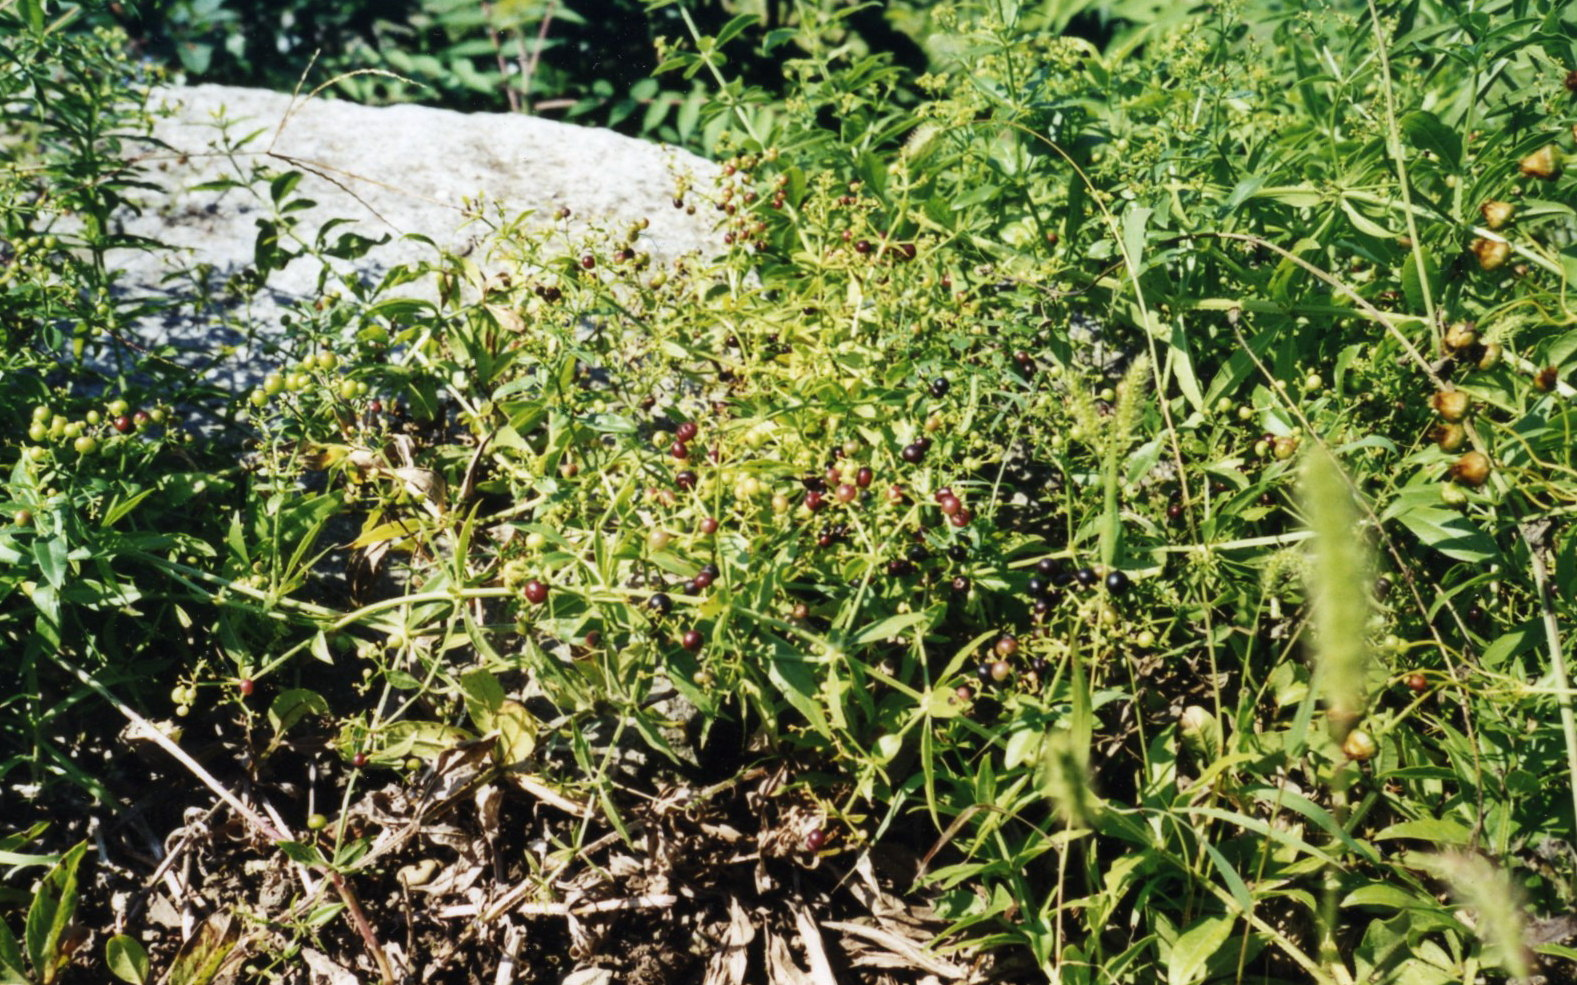 Rubia Tintórea - Planta